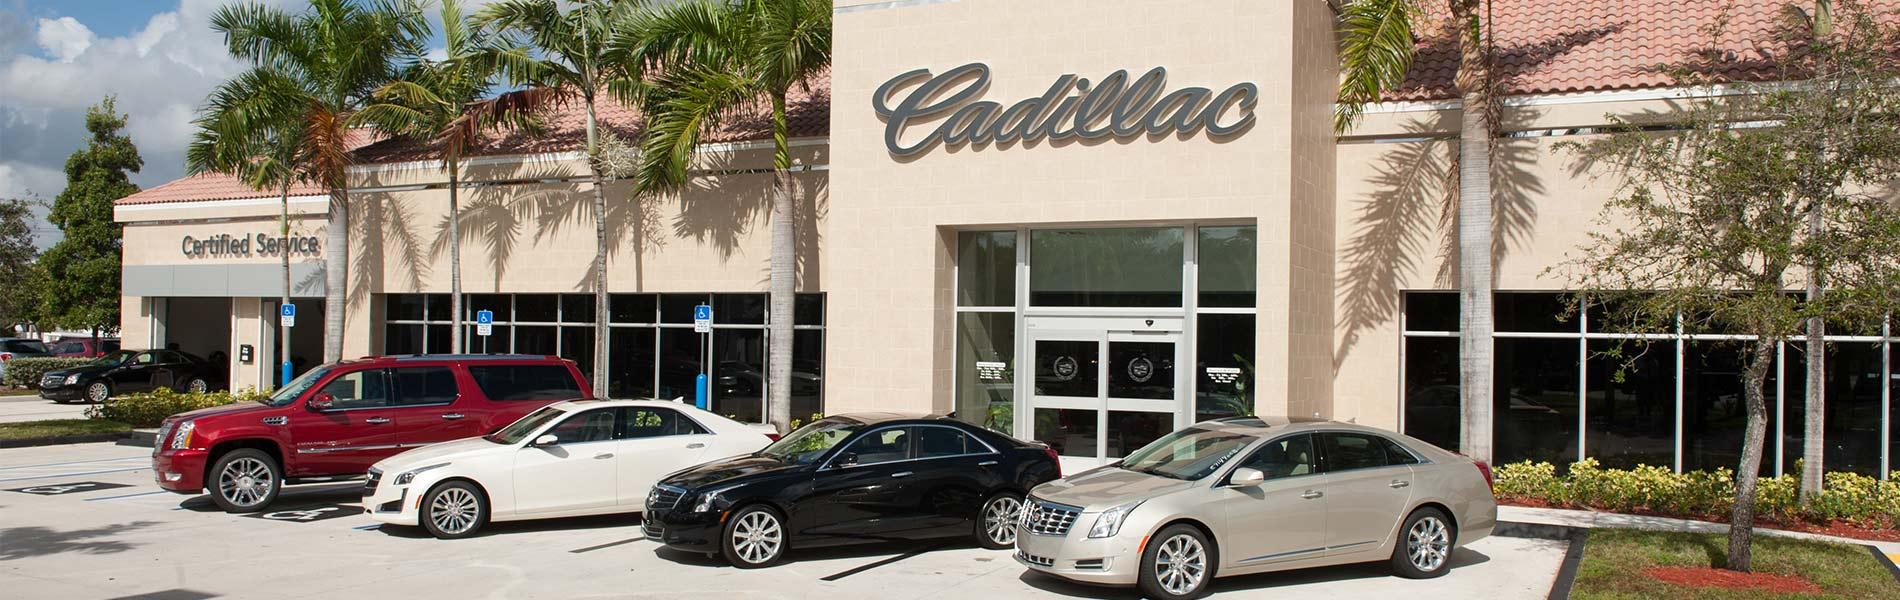 Auto Repair & Car Service | Sunrise, Coral Springs, Lauderhill, FL